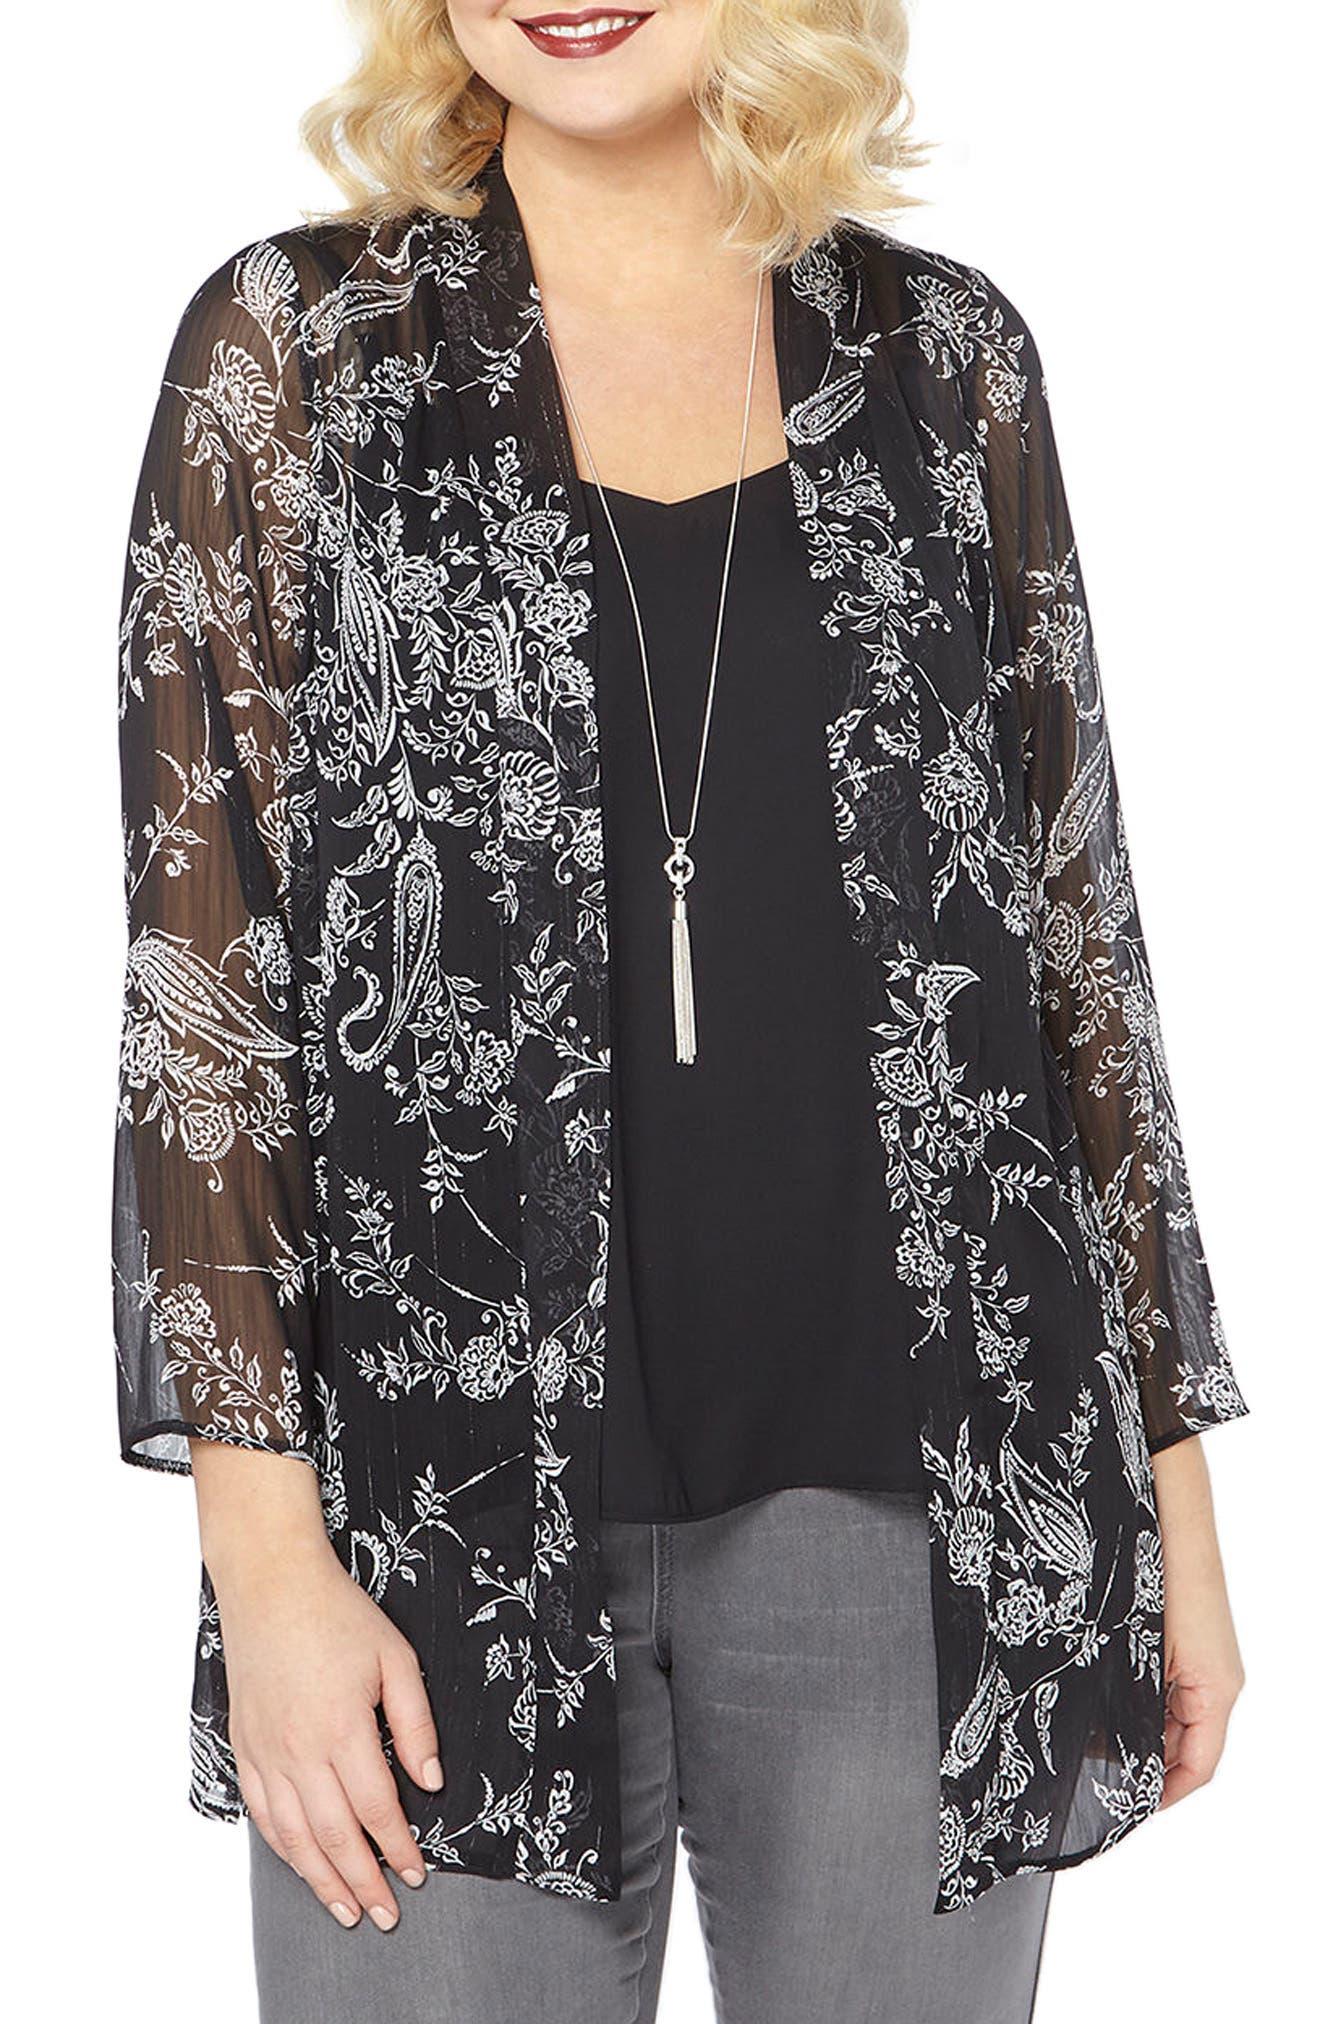 Womens Paisley Kimono Blouse EVANS Discount 2018 New Sale Discount Discount Release Dates DSg3ofOoj8